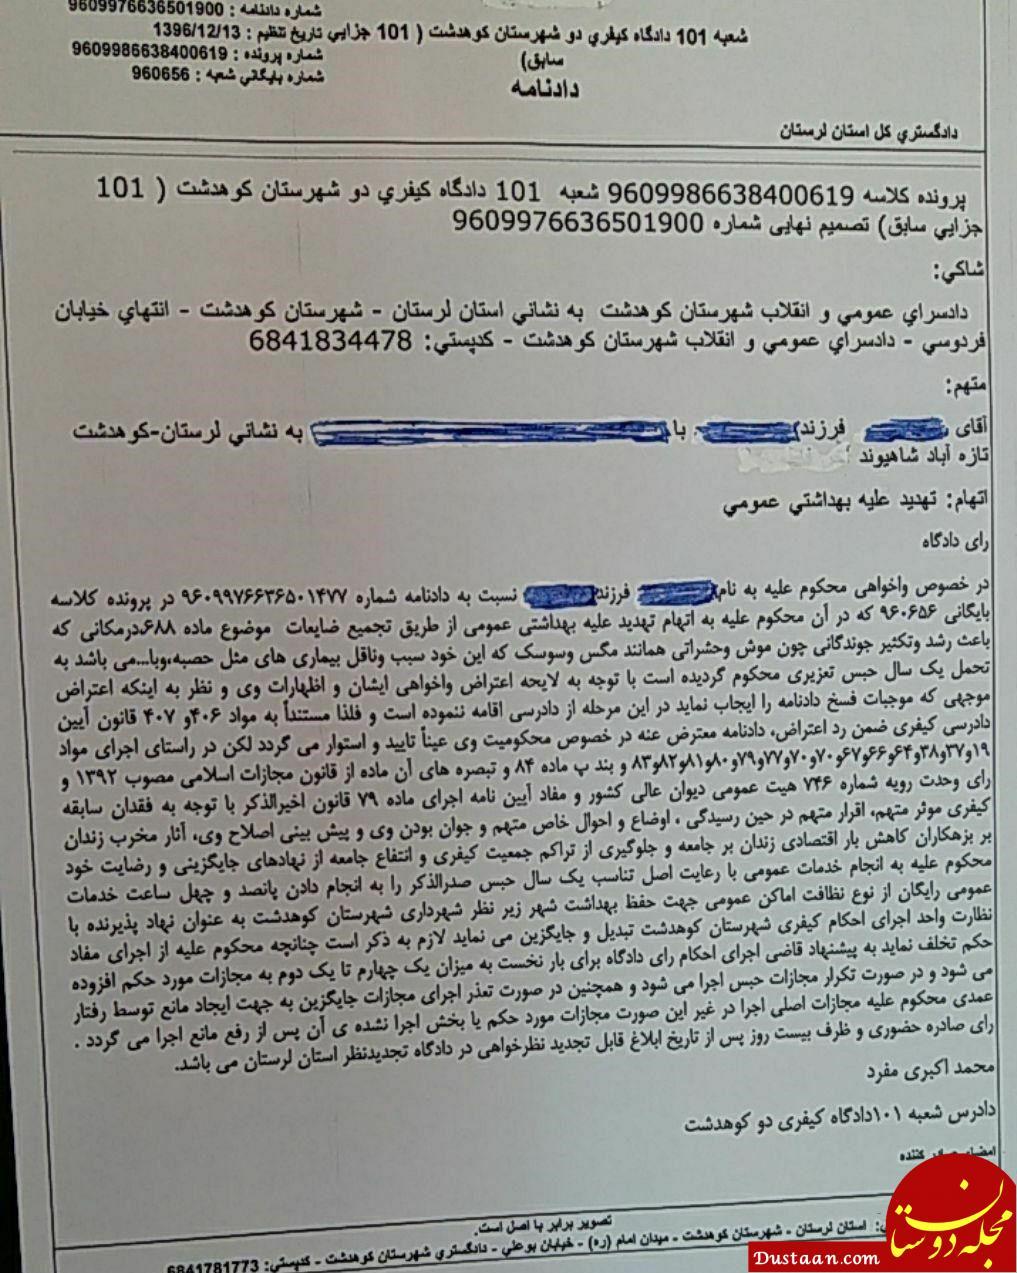 www.dustaan.com نظافت عمومی رایگان جایگزین حبس برای یک جوان کوهدشتی شد